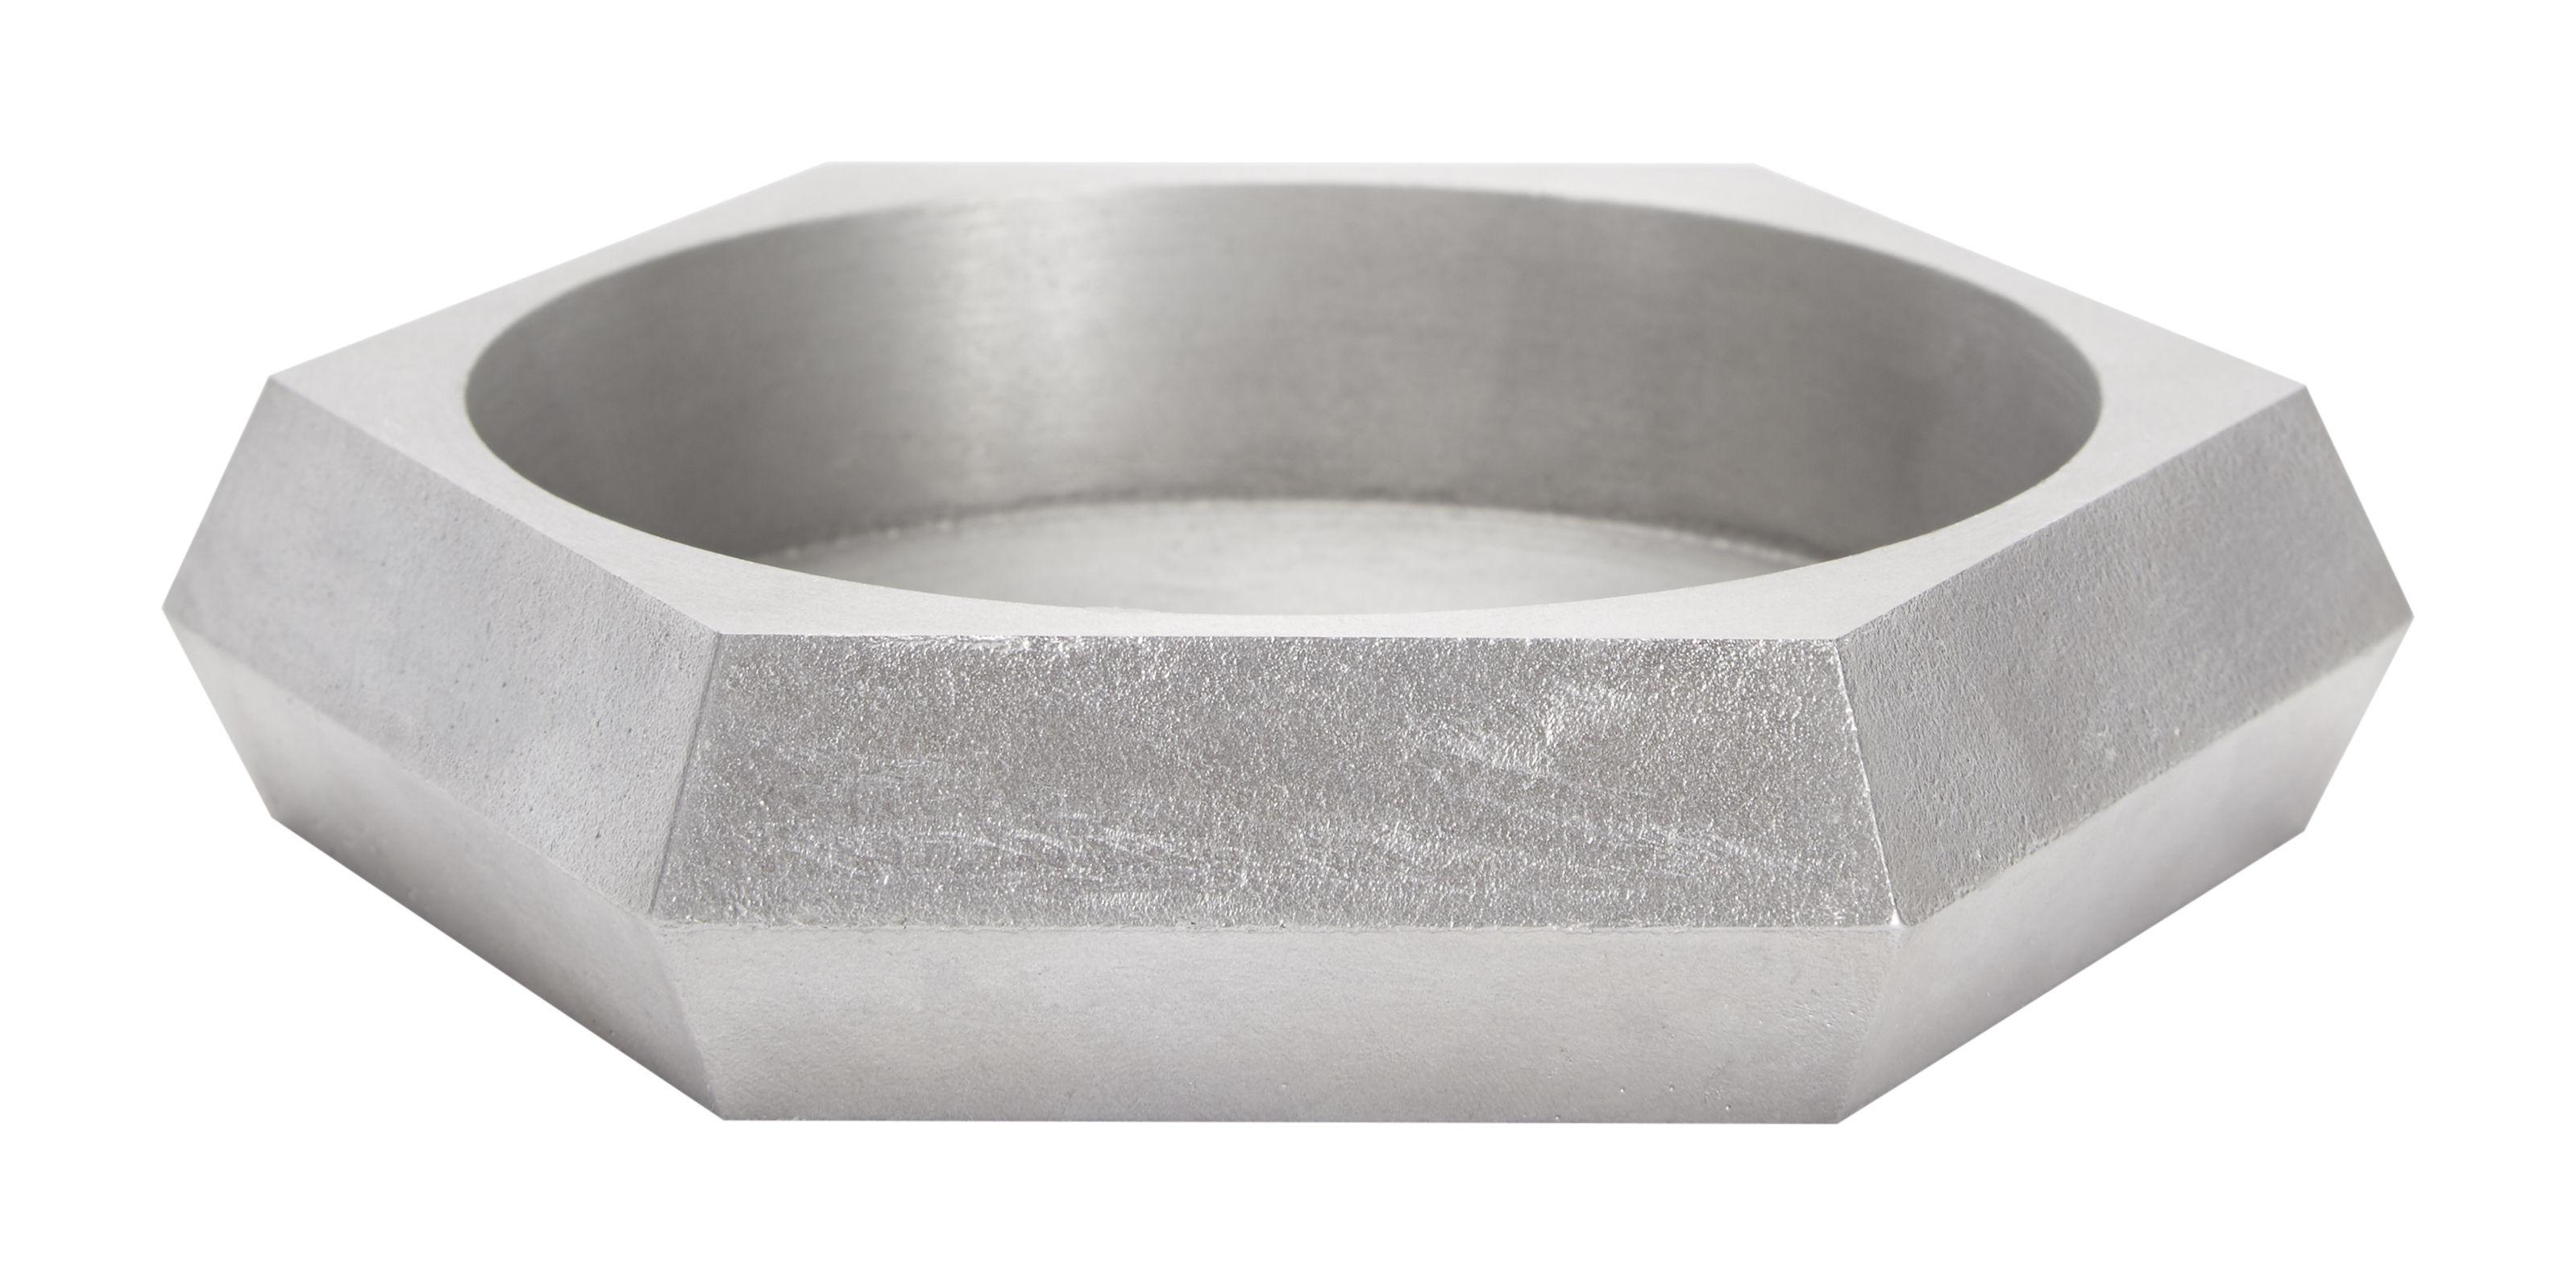 alloy pillar set aus kerze kerzenst nder aus aluminiumguss tom dixon duftkerze. Black Bedroom Furniture Sets. Home Design Ideas